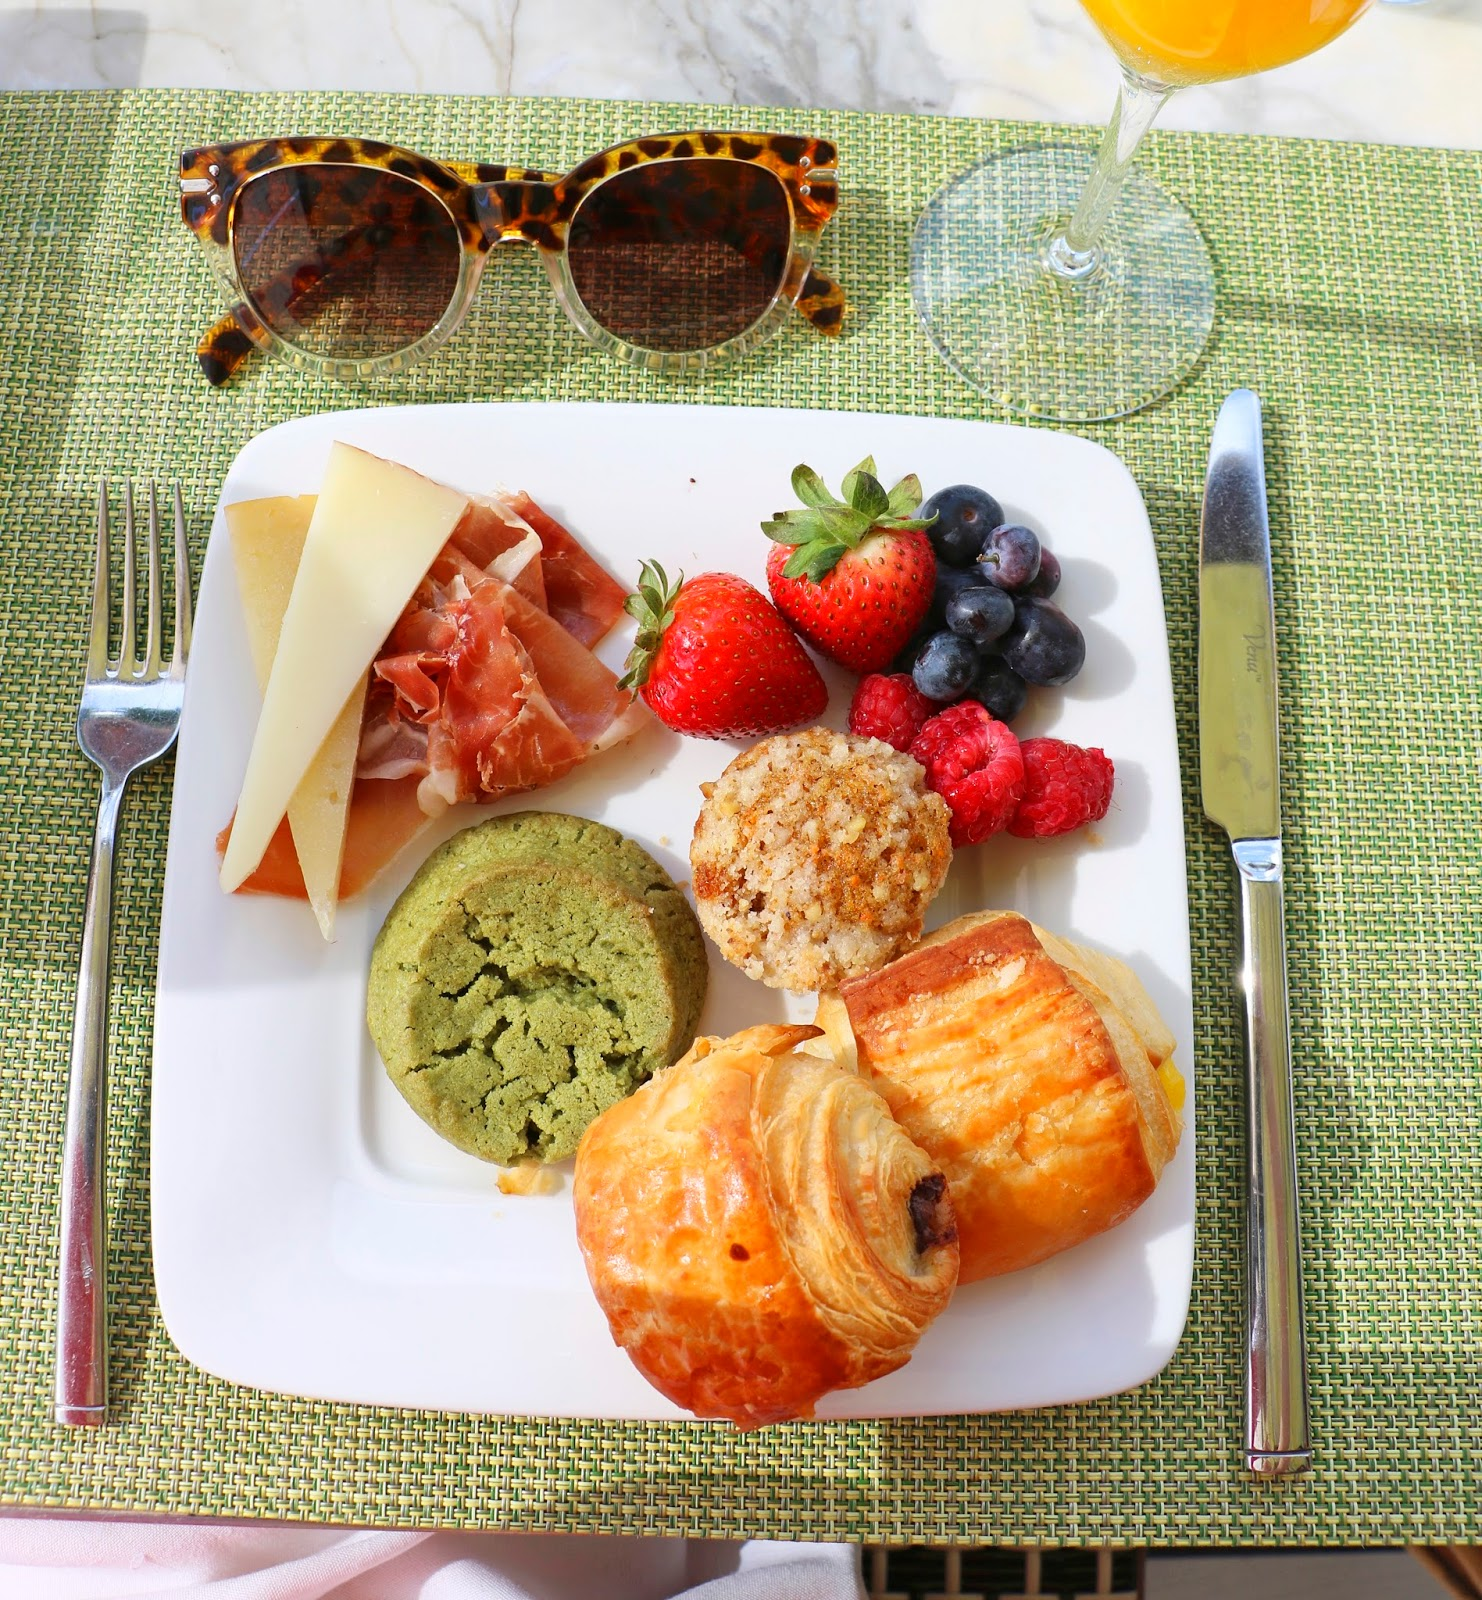 Yummy breakfast vacationing in Miami